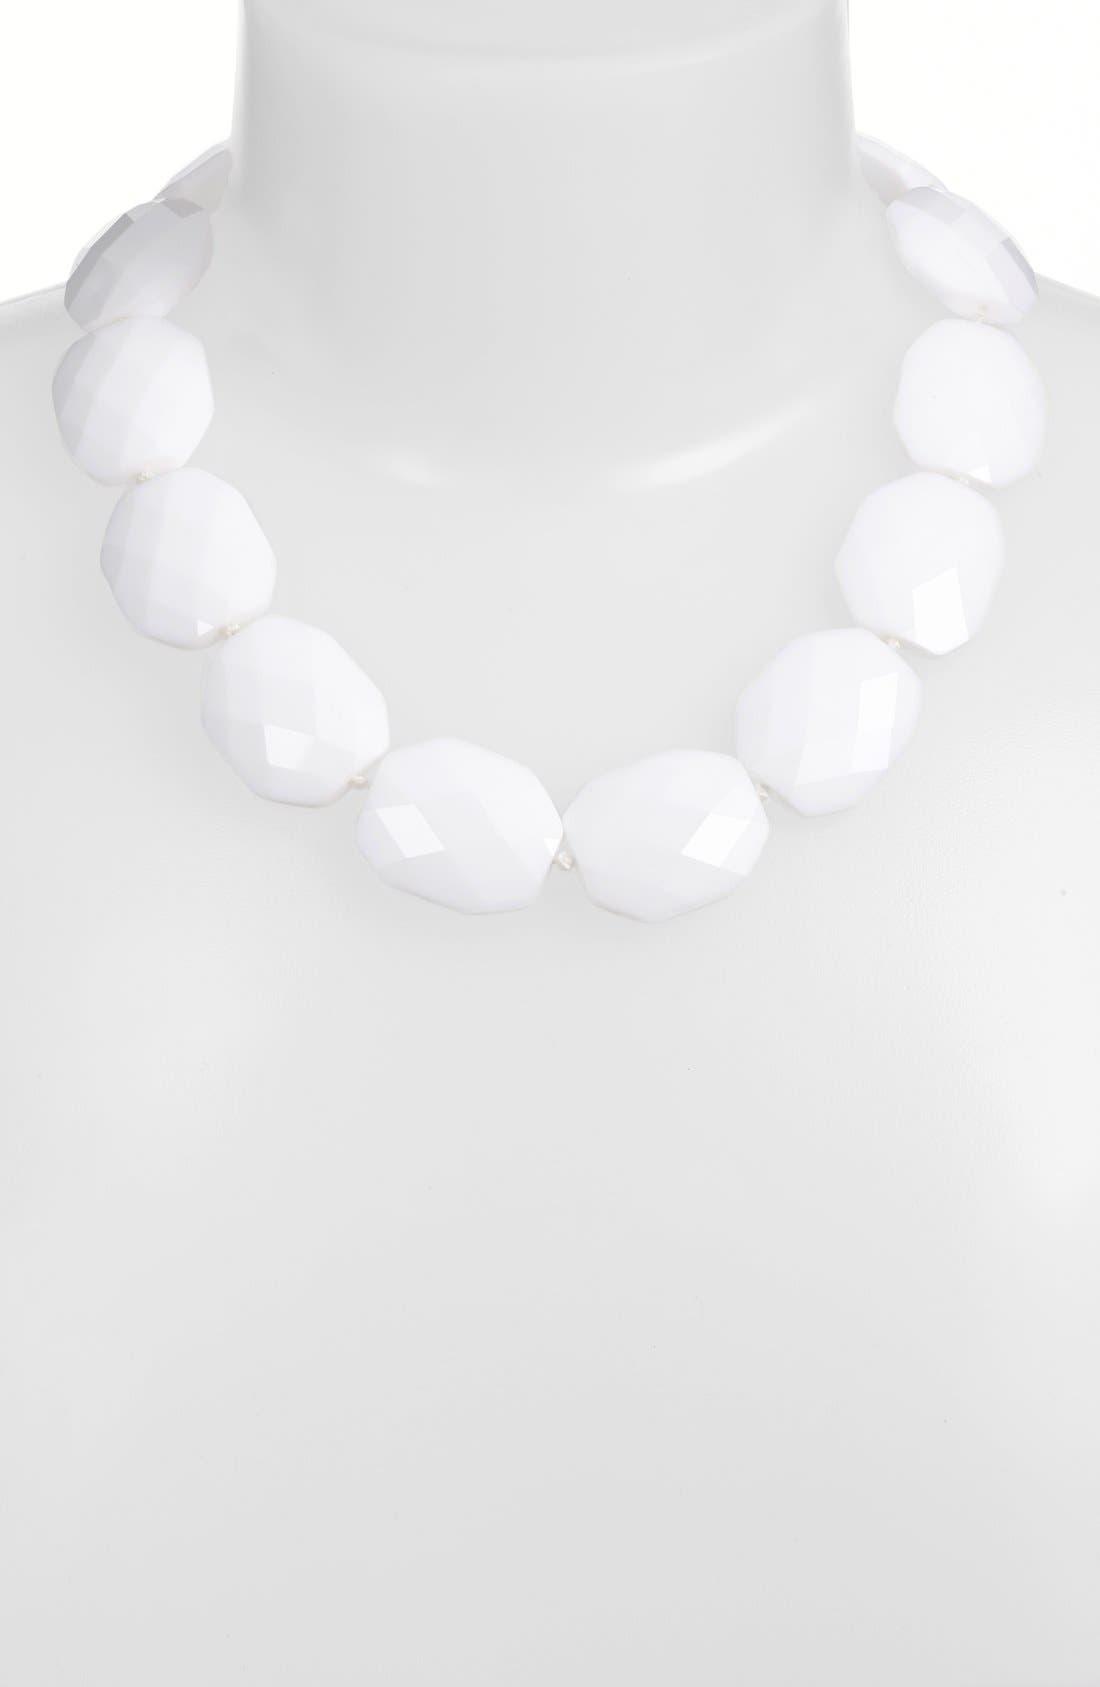 LAUREN RALPH LAUREN,                             Stone Collar Necklace,                             Alternate thumbnail 2, color,                             100